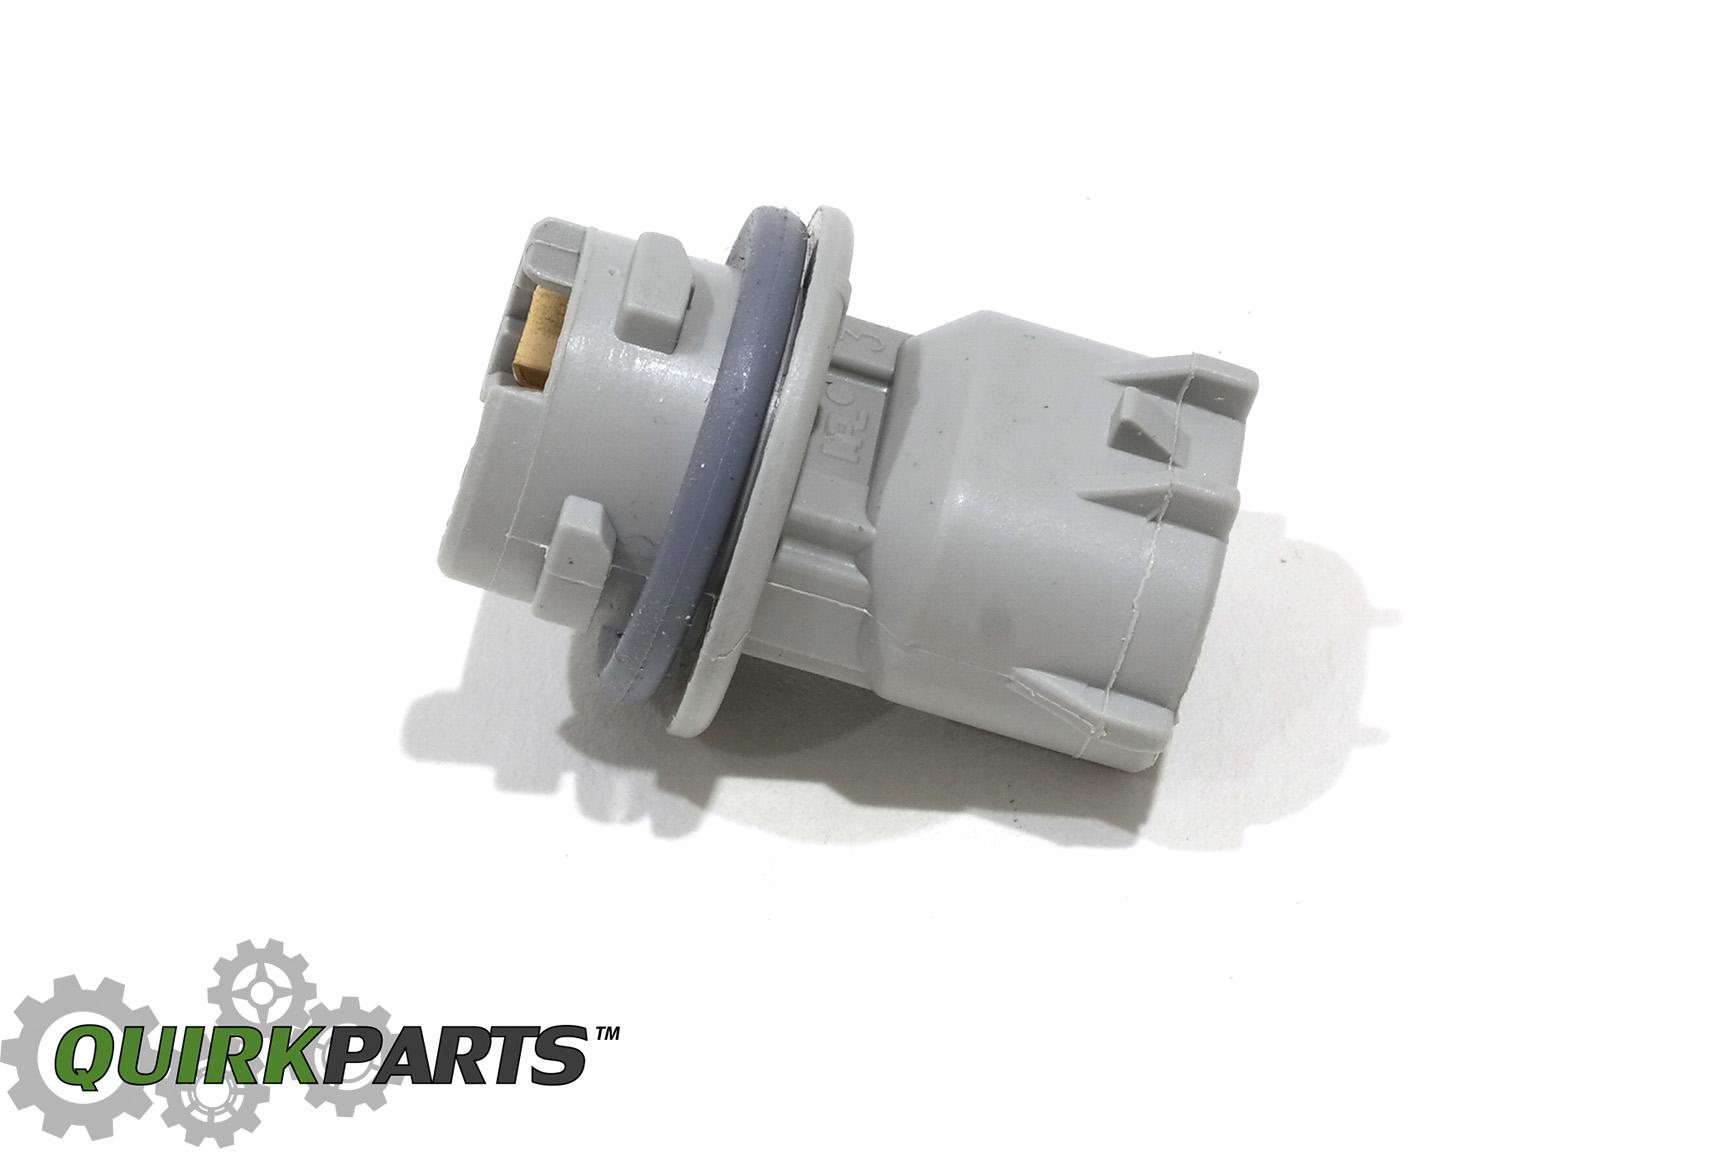 Mazda 6 Headlamp Socket : Mazda headlamp light bulb turn signal socket oem gk a